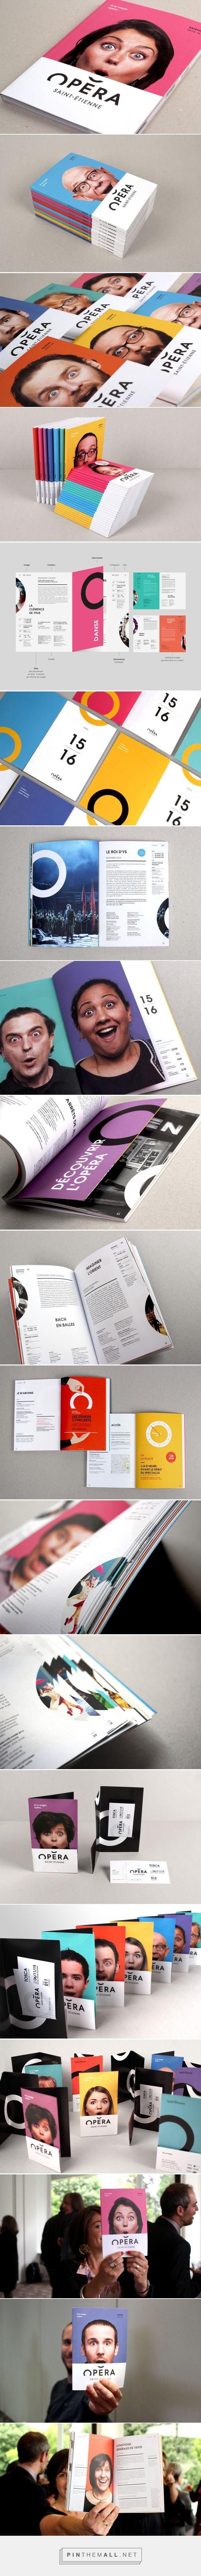 Saint Etienne Opera House - Brand design